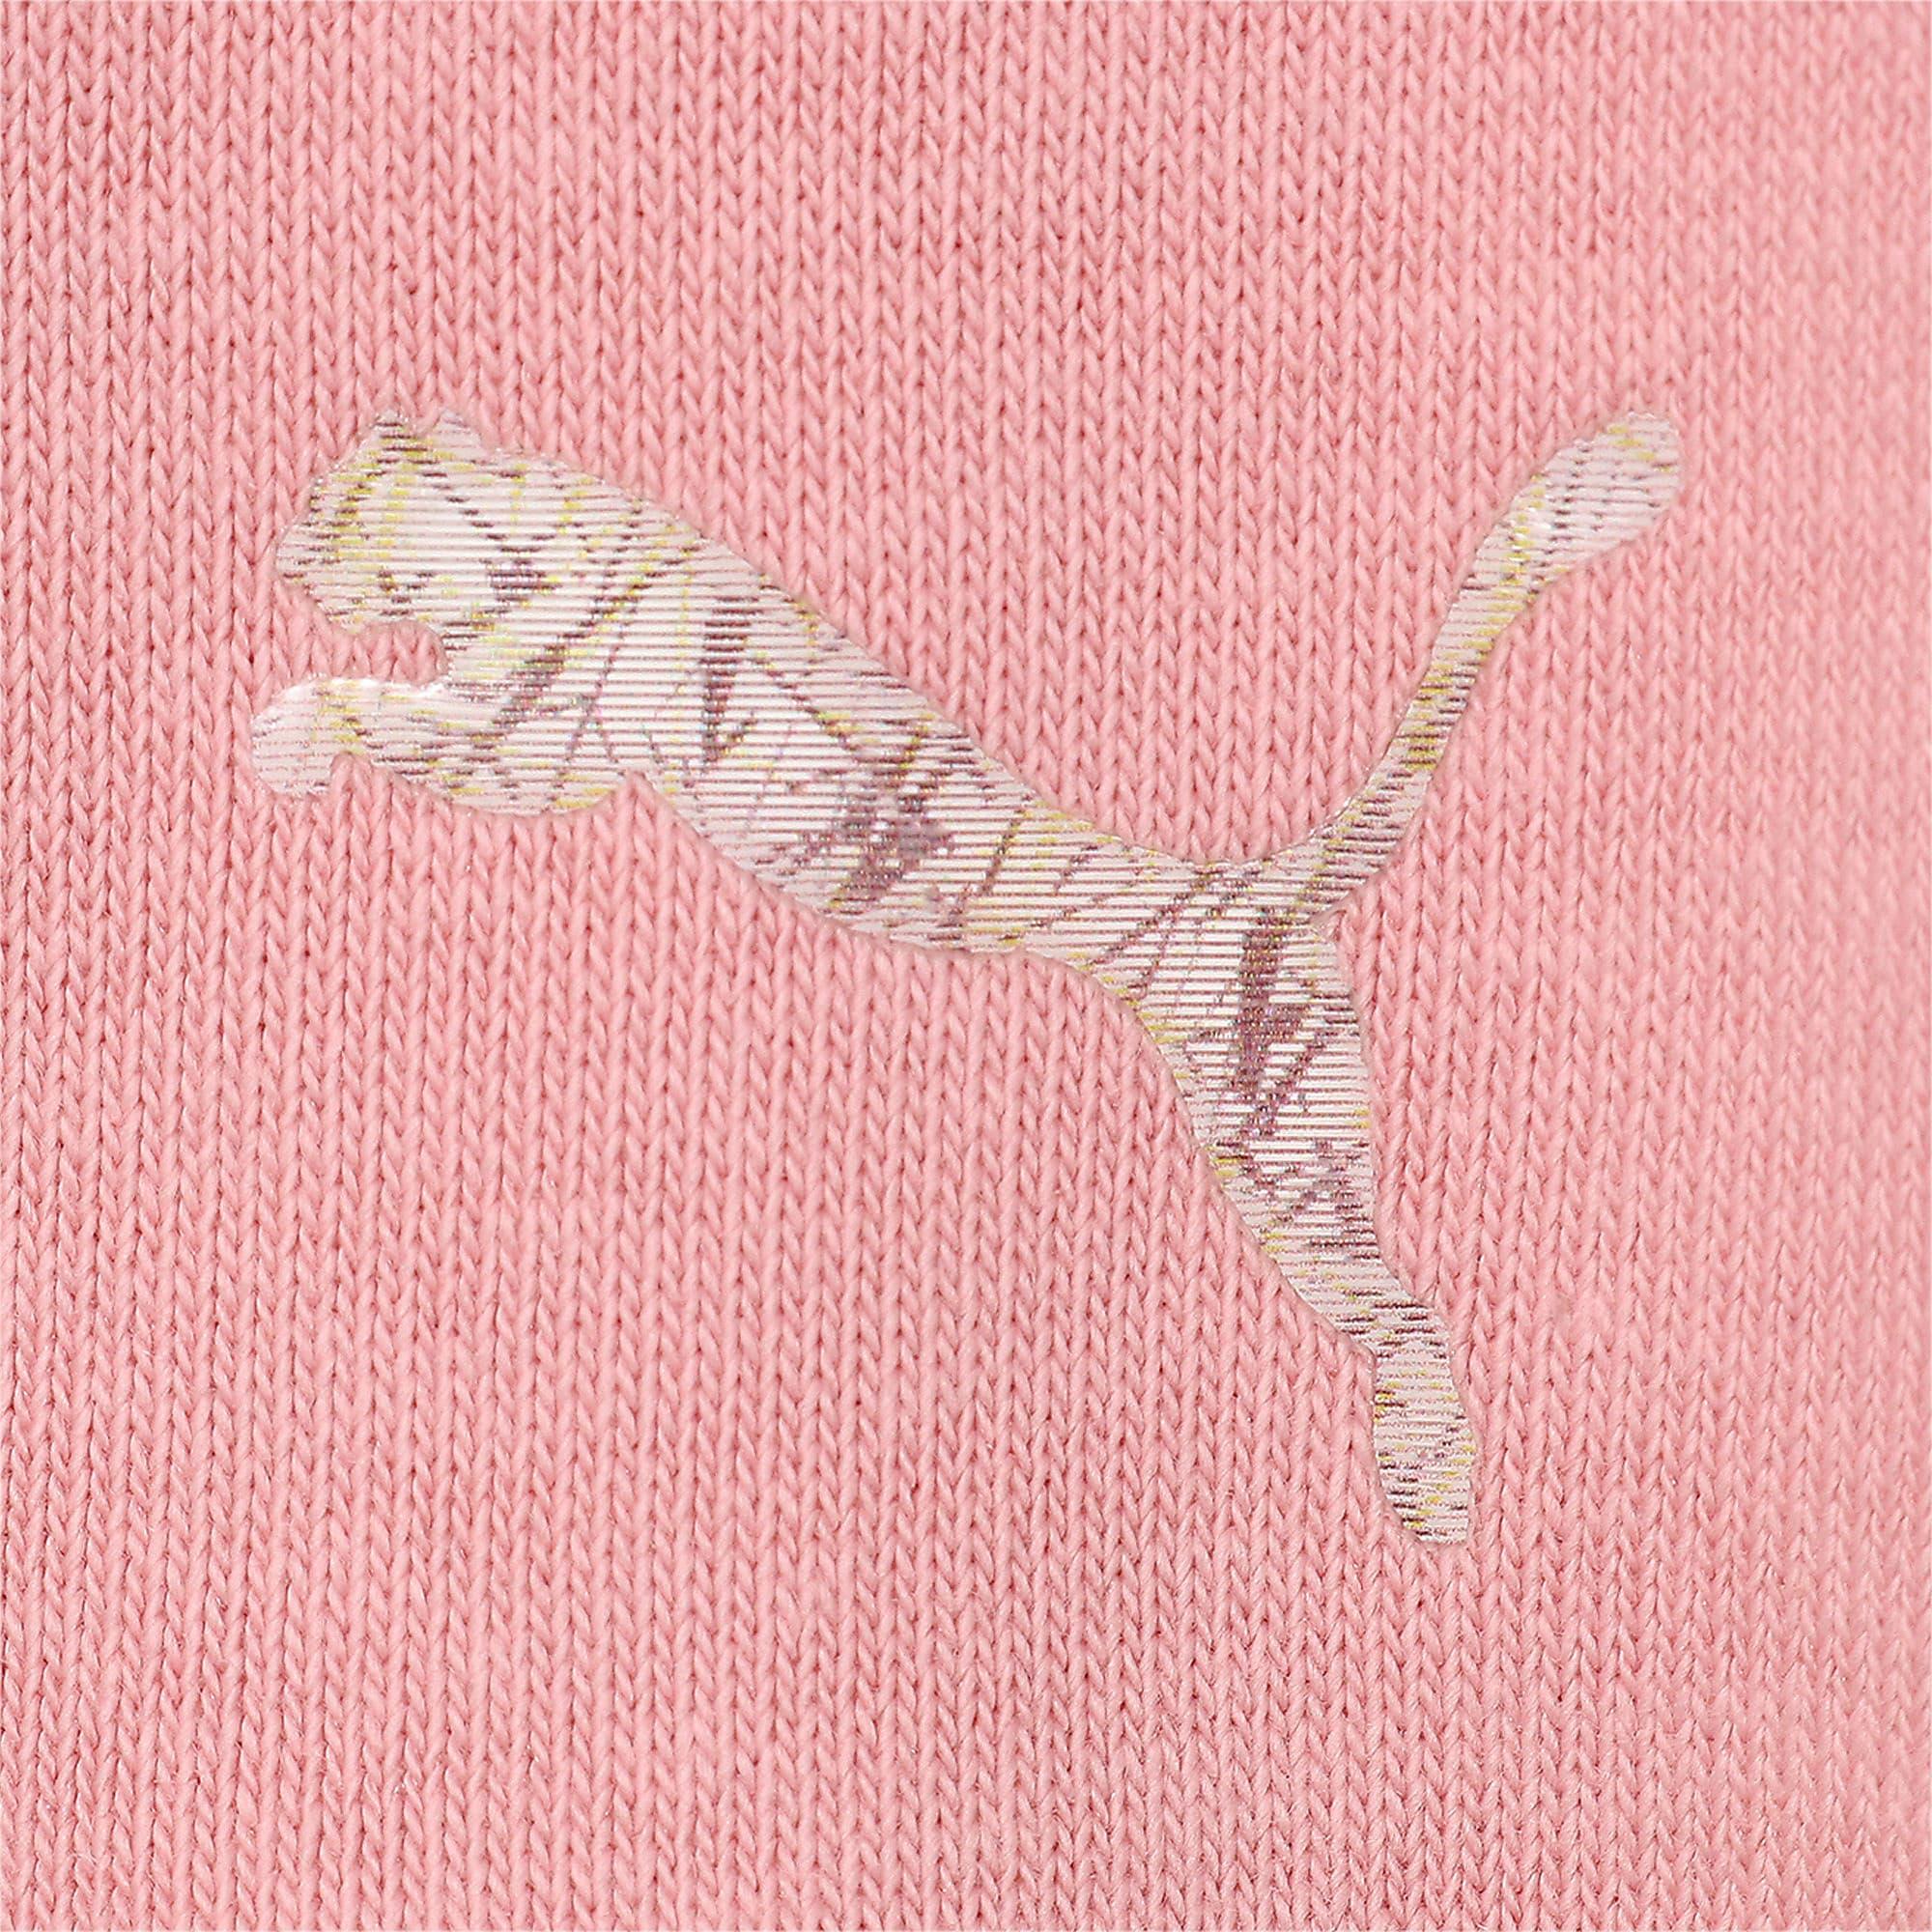 Thumbnail 4 of CHASE ウィメンズ フーデッドドレス, Bridal Rose, medium-JPN